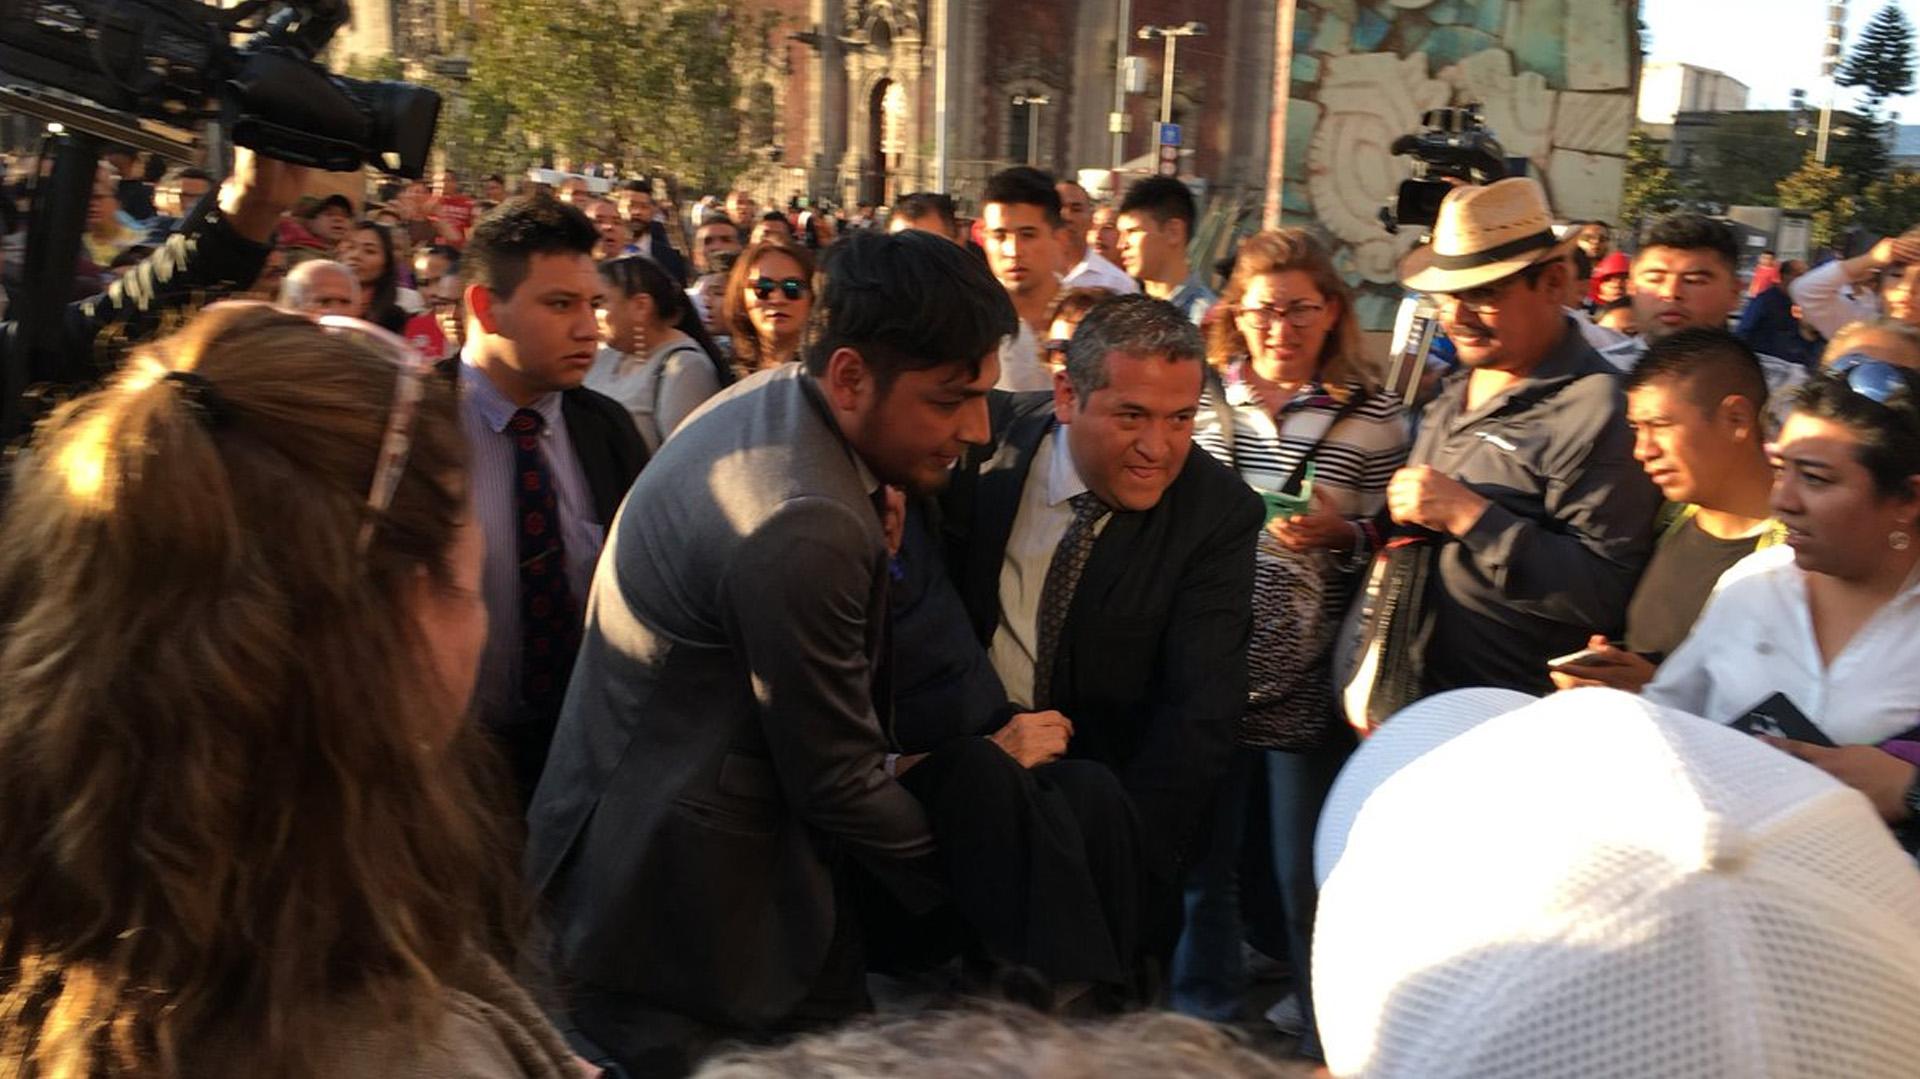 El momento en el que se desvaneció el legislador (Foto: @Andreart2001)